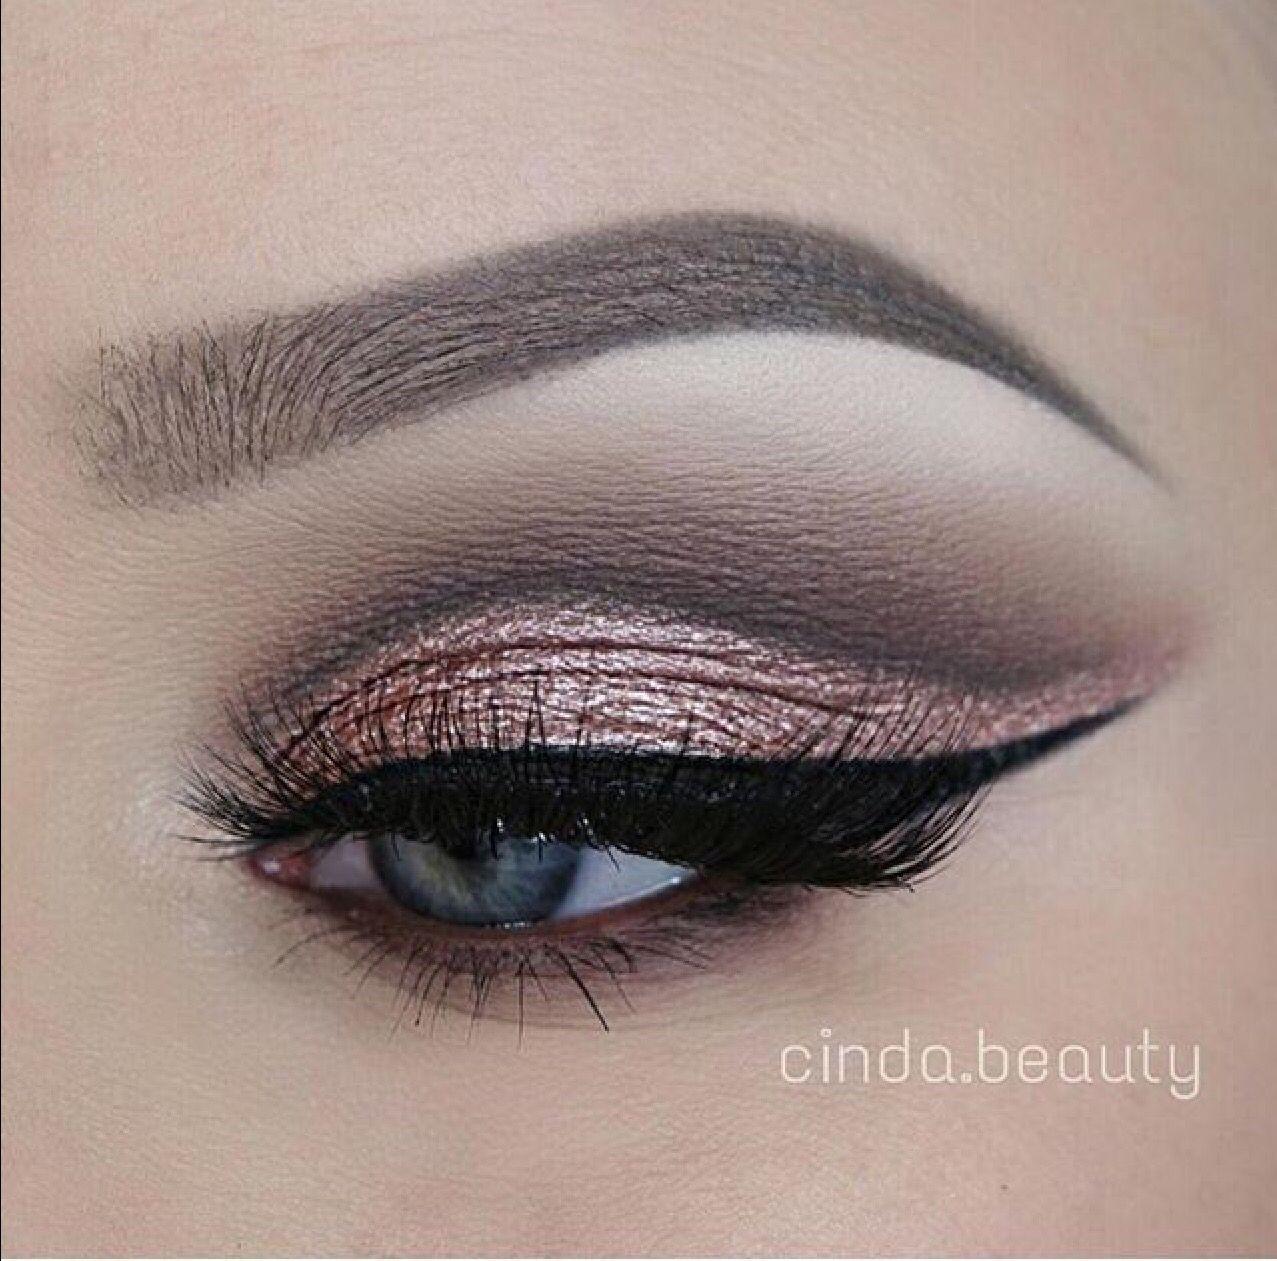 Absolutely Stunning! ✨ @cinda.beauty   Hey Guys! Please follow my Instagram @beautywithgg Tysm I love you all    #makeup #eyemakeup #flawless #beauty #slay #work #eyebrows #brown #eyes #eye #eyebrowsonfleek #eyeliner #wyeshadow #blue #smokey #salty #bae #goals #makeupgoals